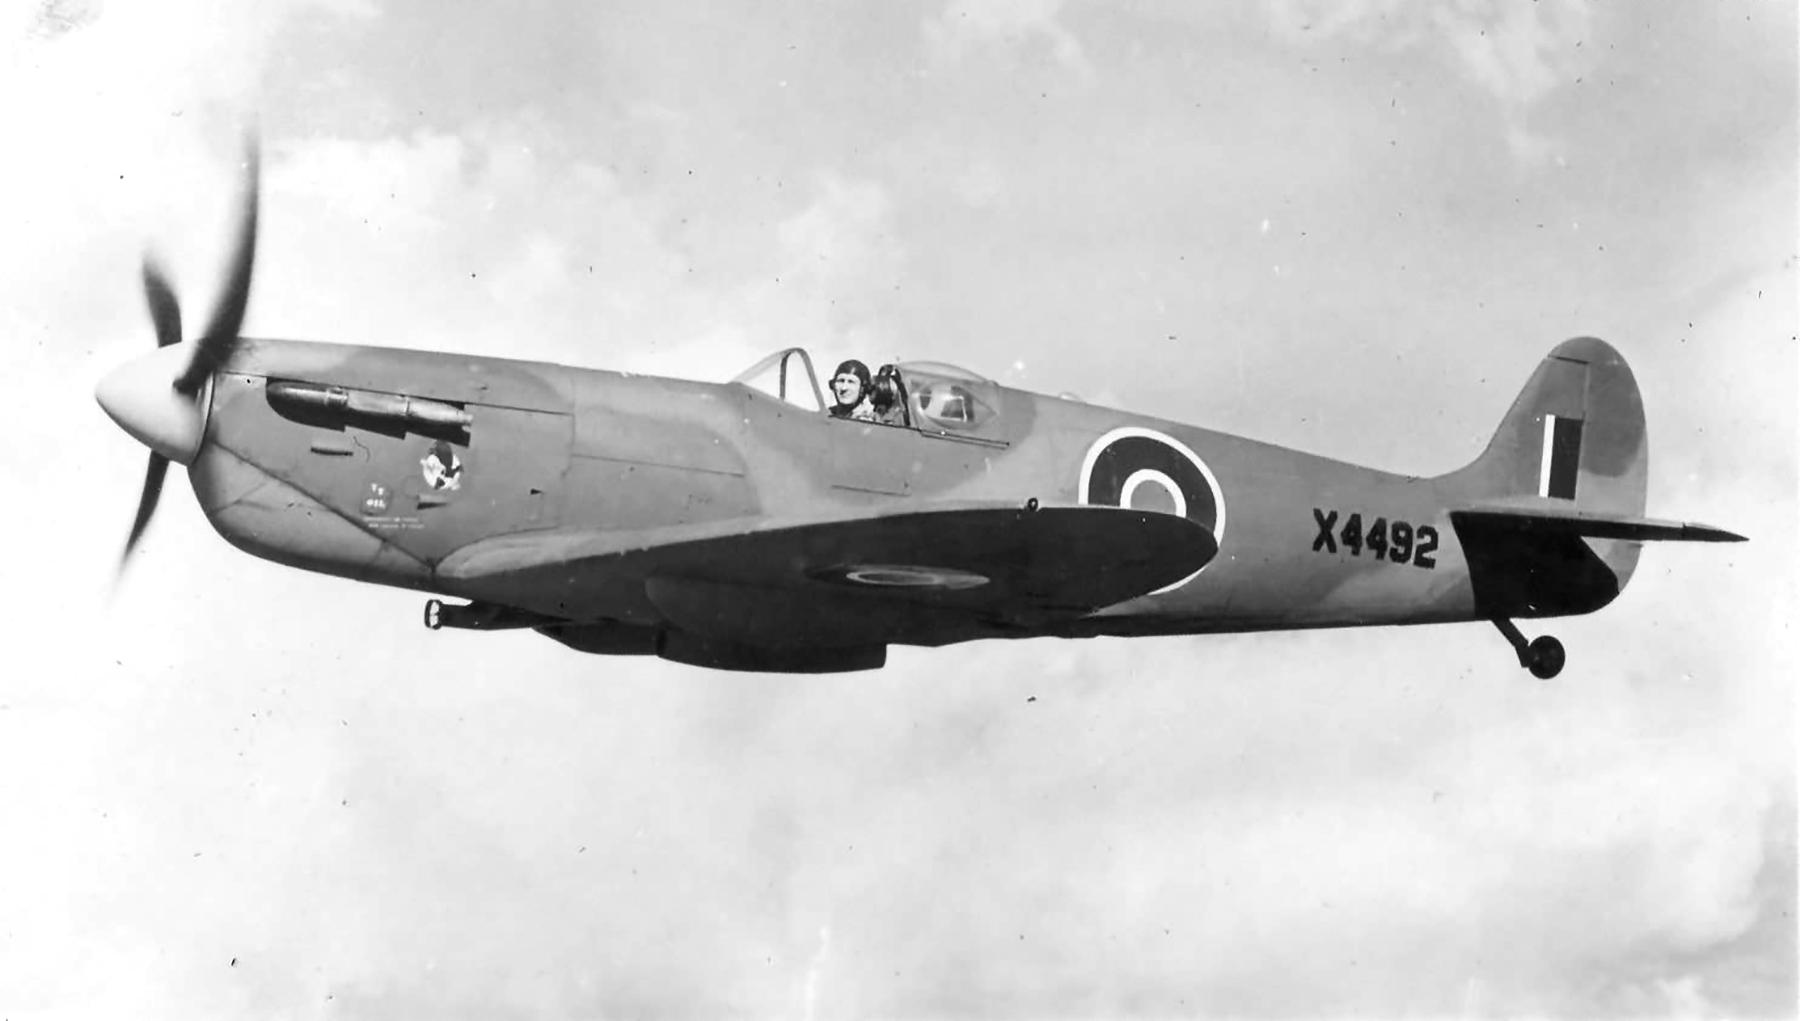 Spitfire PRIV RAF 1PRU X4492 web 01